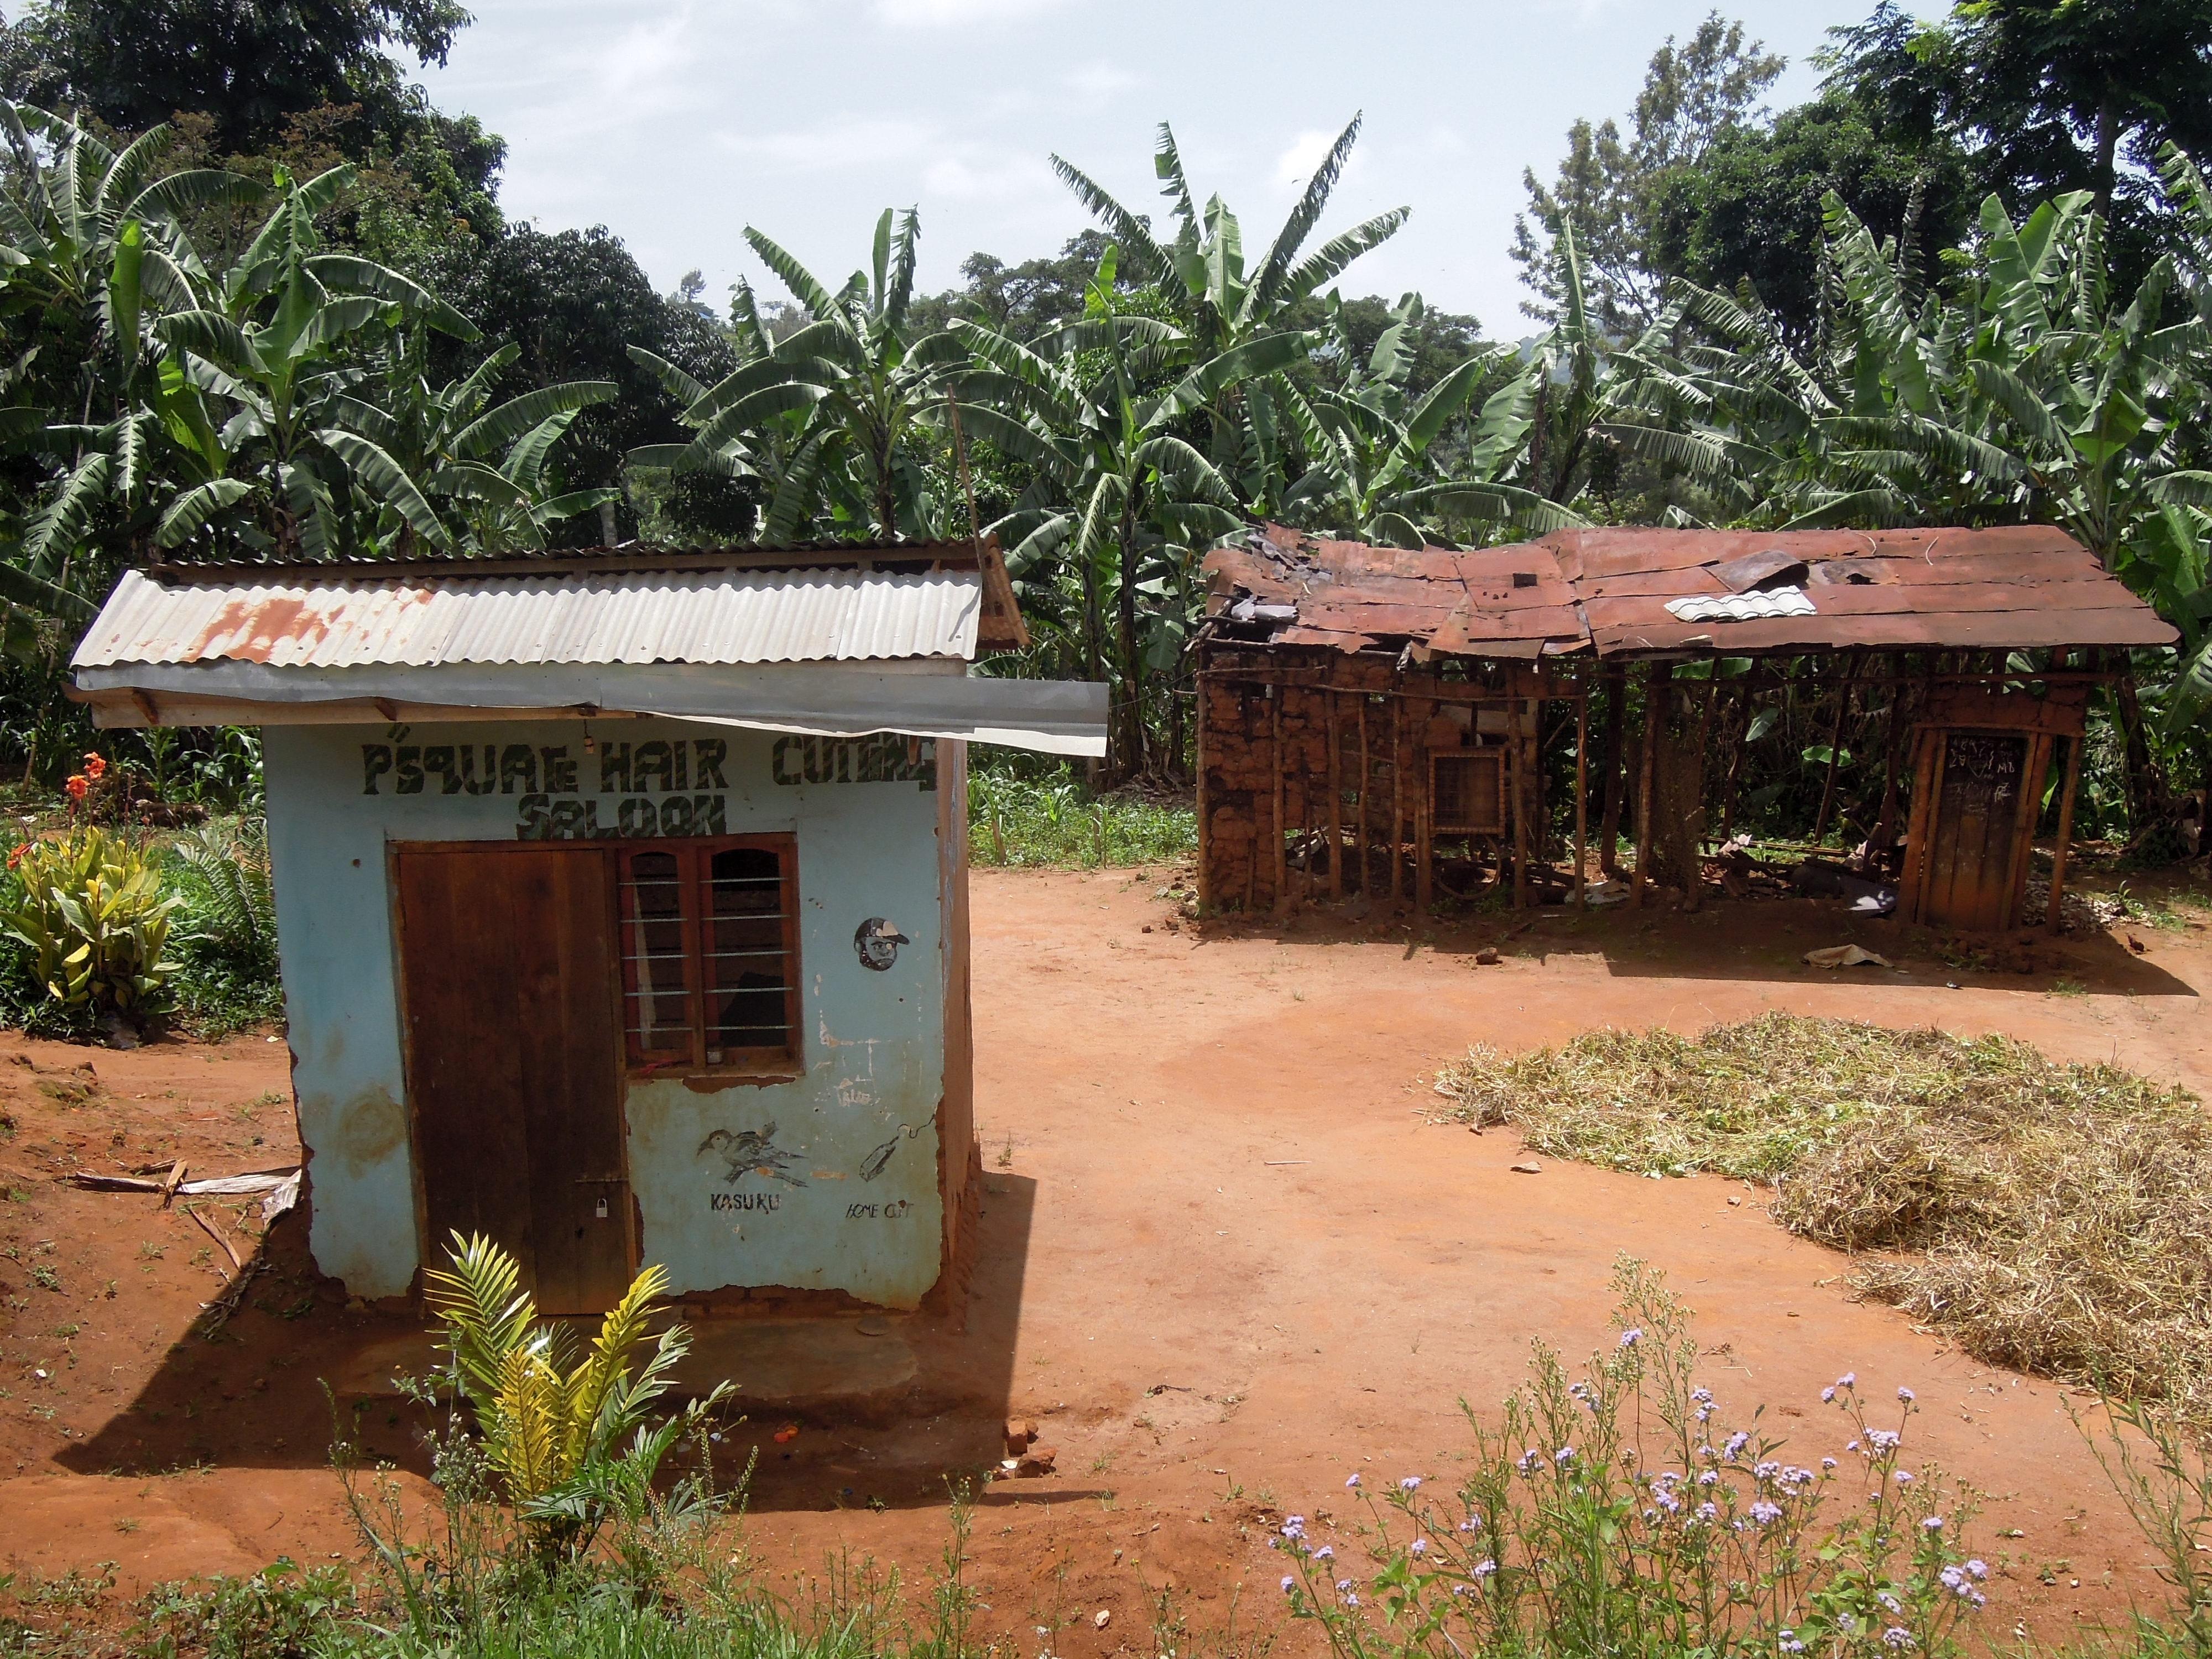 Salon fryzjerski, Irente, Usambara Mountains, Tanzania, fot. M. Lehrmann